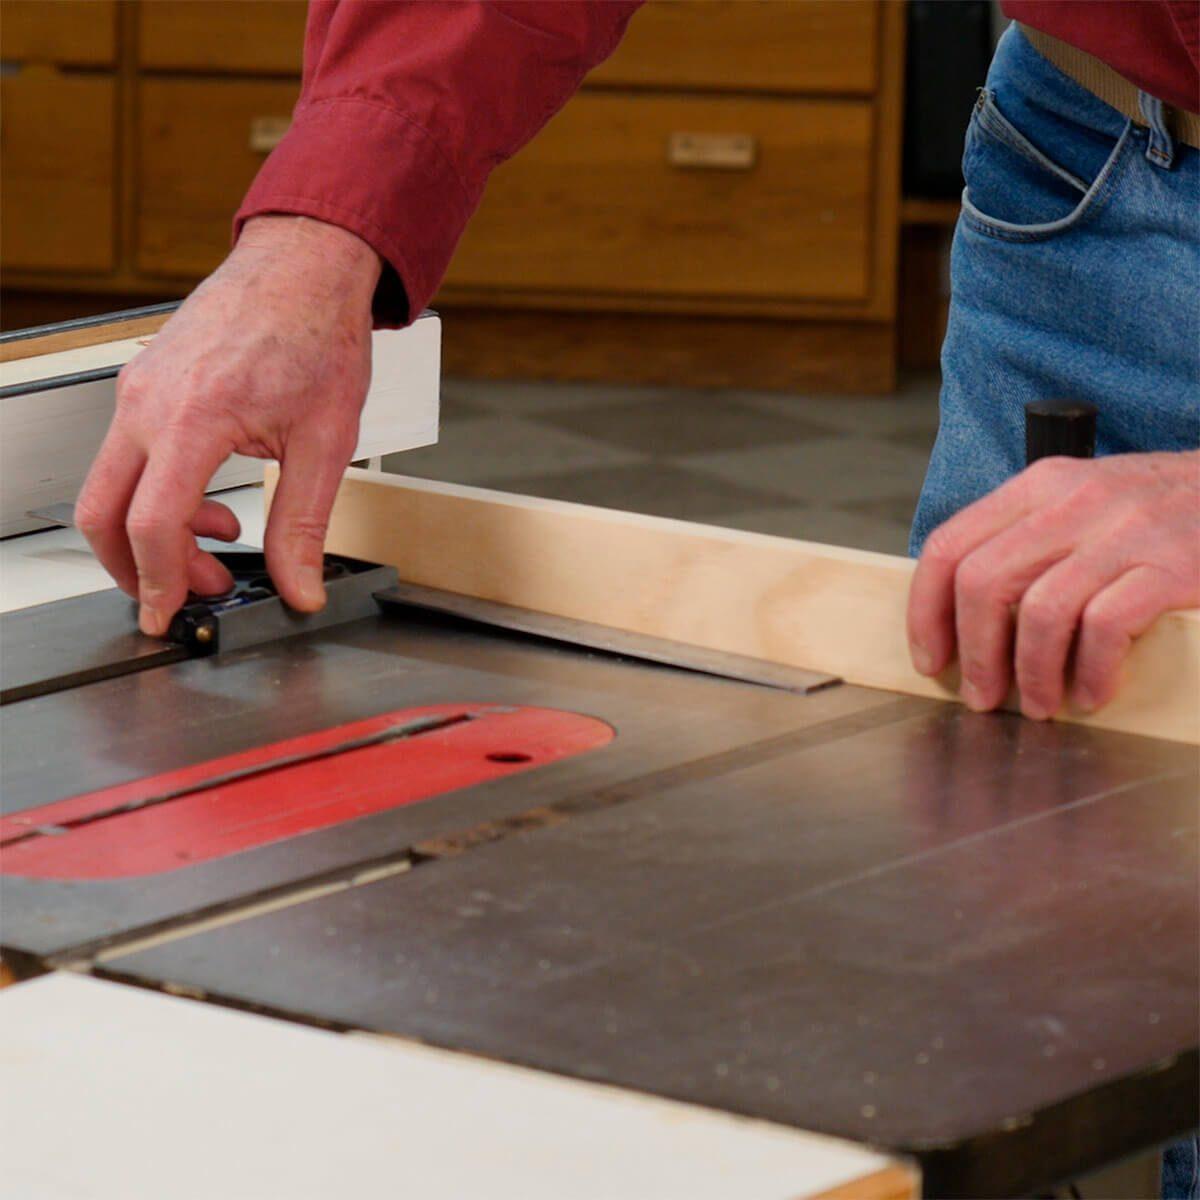 set blade to 1 in longer than desired length